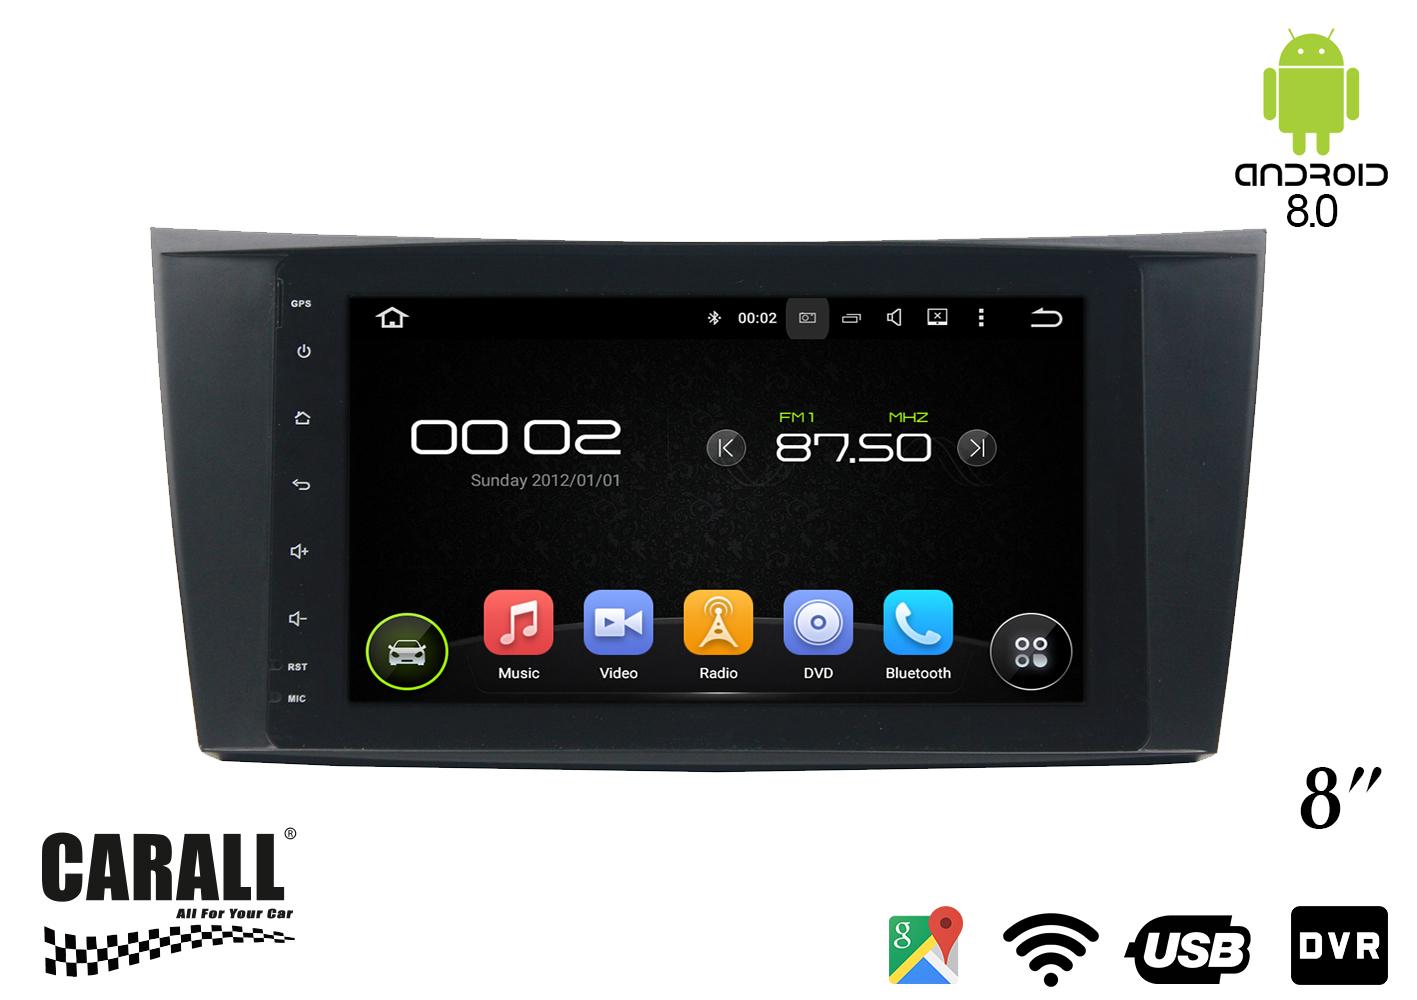 Autoradio Android 8,0 Mercedes Benz W211 GPS DVD USB SD WI-FI Bluetooth Navigatore - KIT